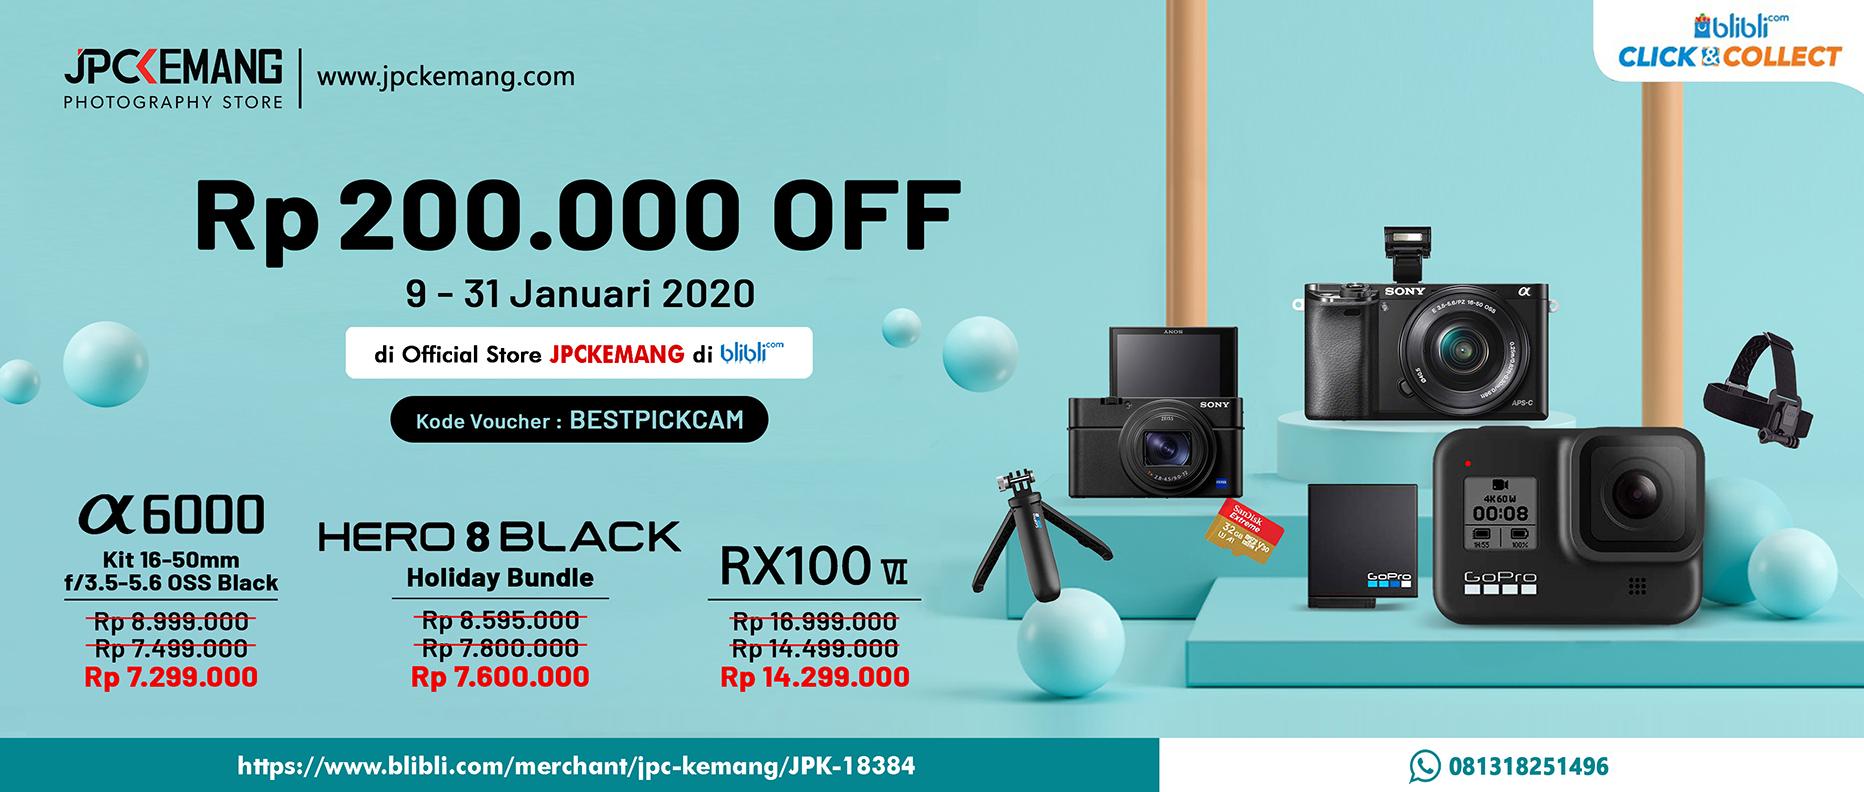 Promo Blibli Gopro Hero 8 Holiday, Sony A6000, and Sony RX100 VI